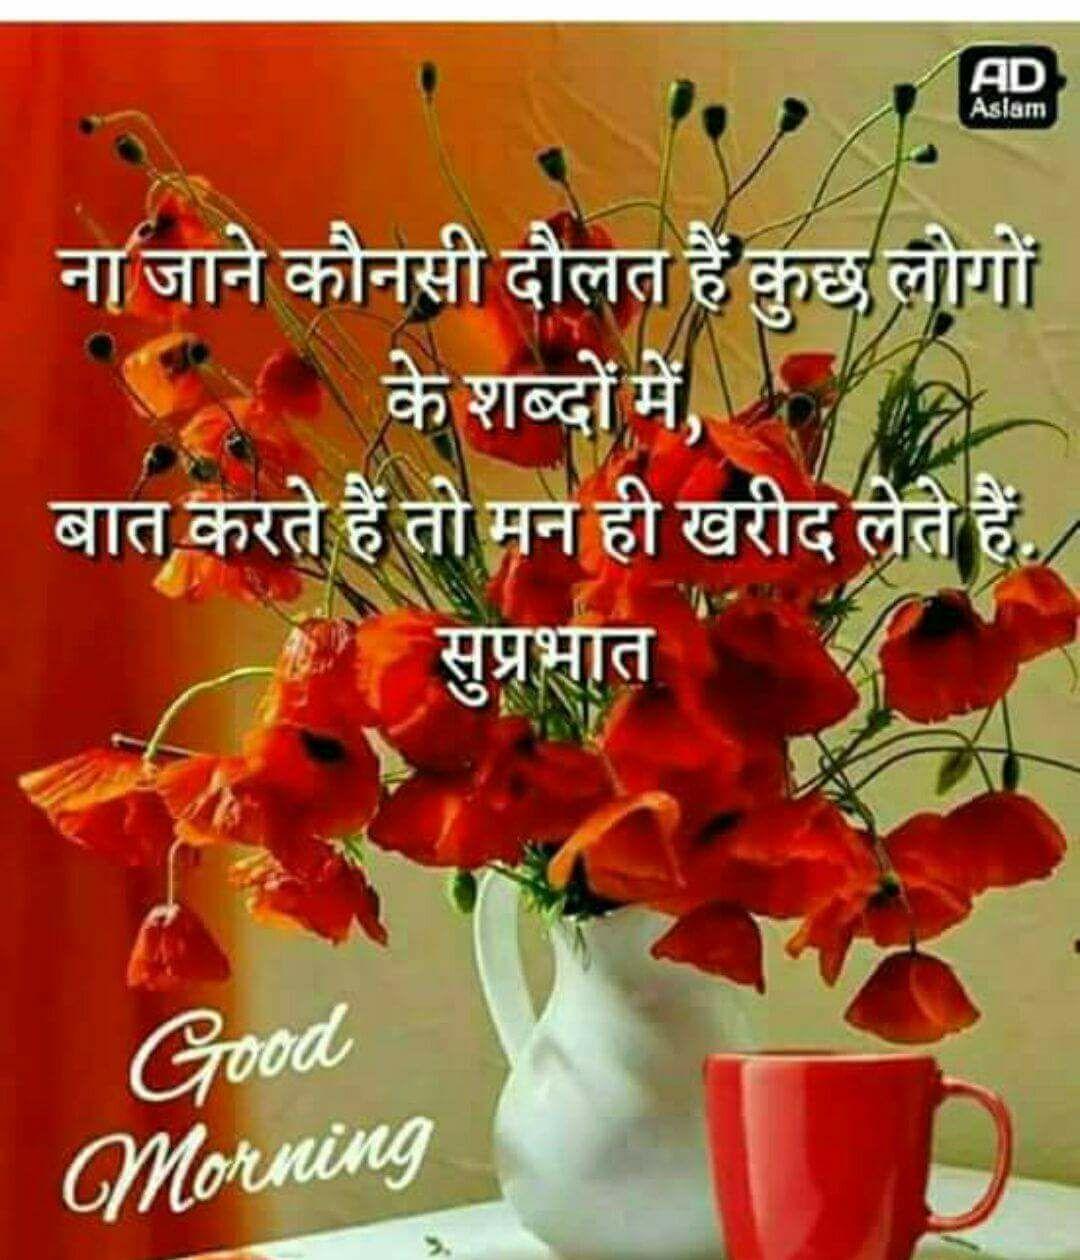 wishes-good-morning-in-hindi-27.jpg